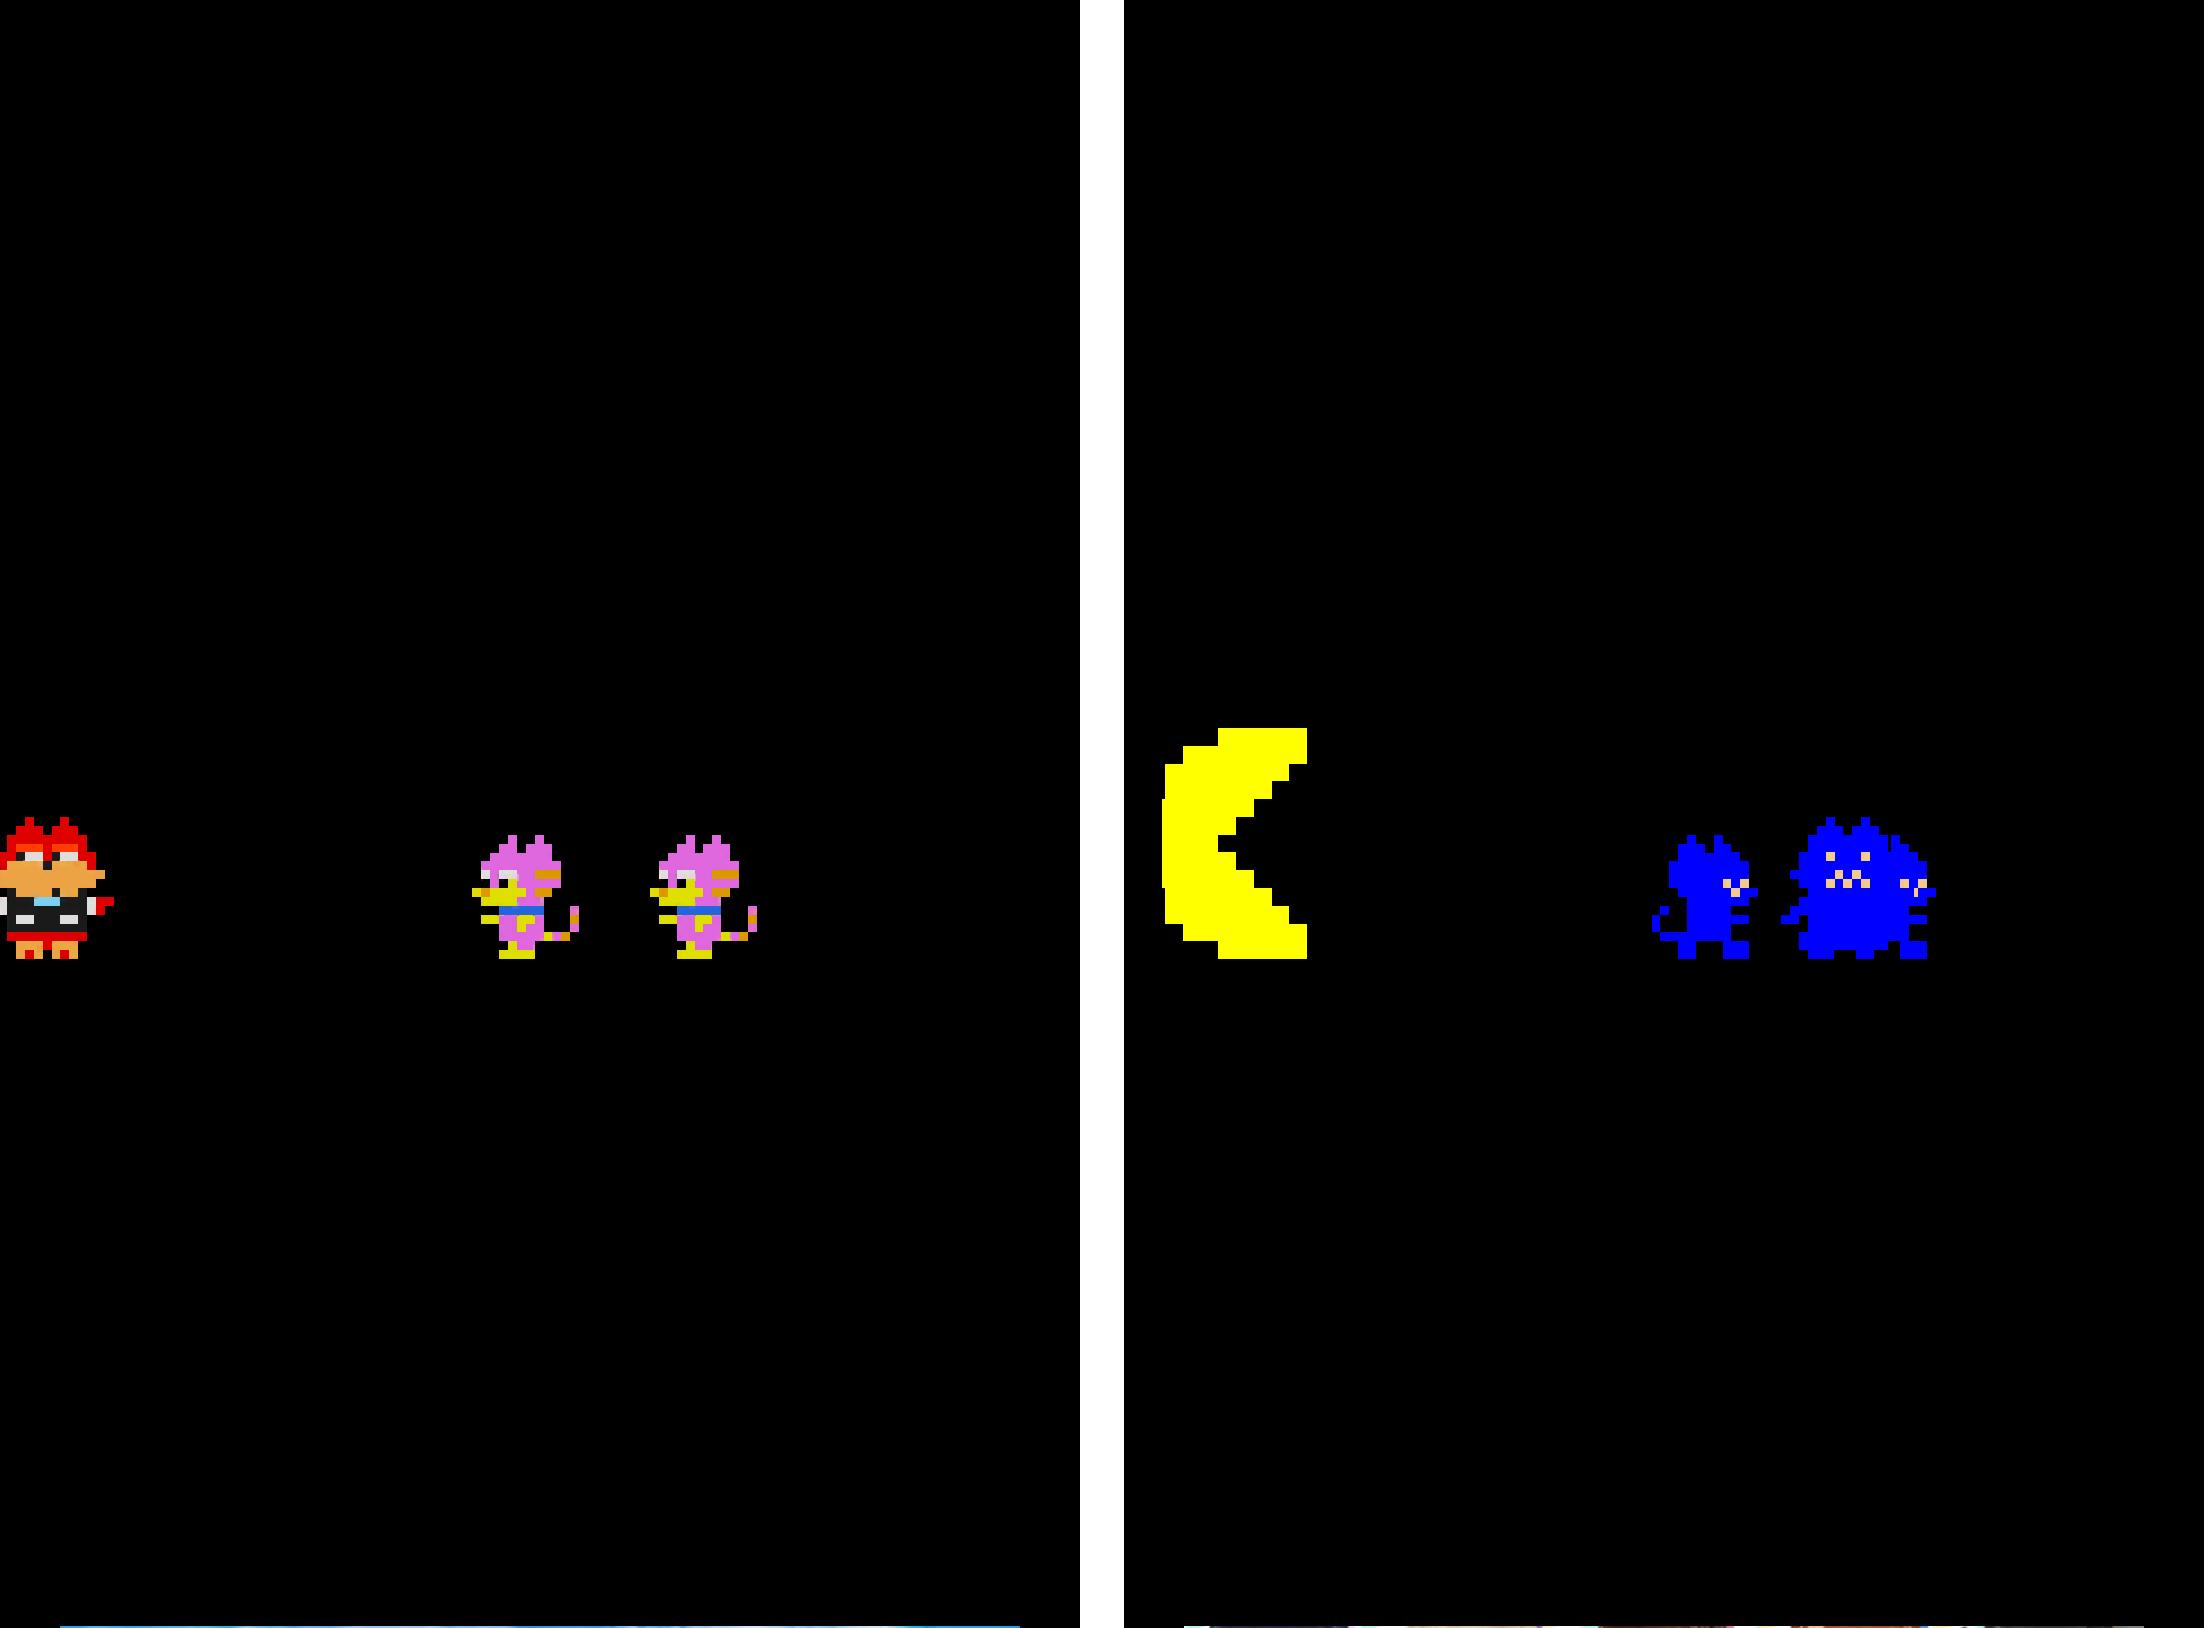 androidアプリ タッチ・ザ・マッピー 復活のニャームコ団攻略スクリーンショット8